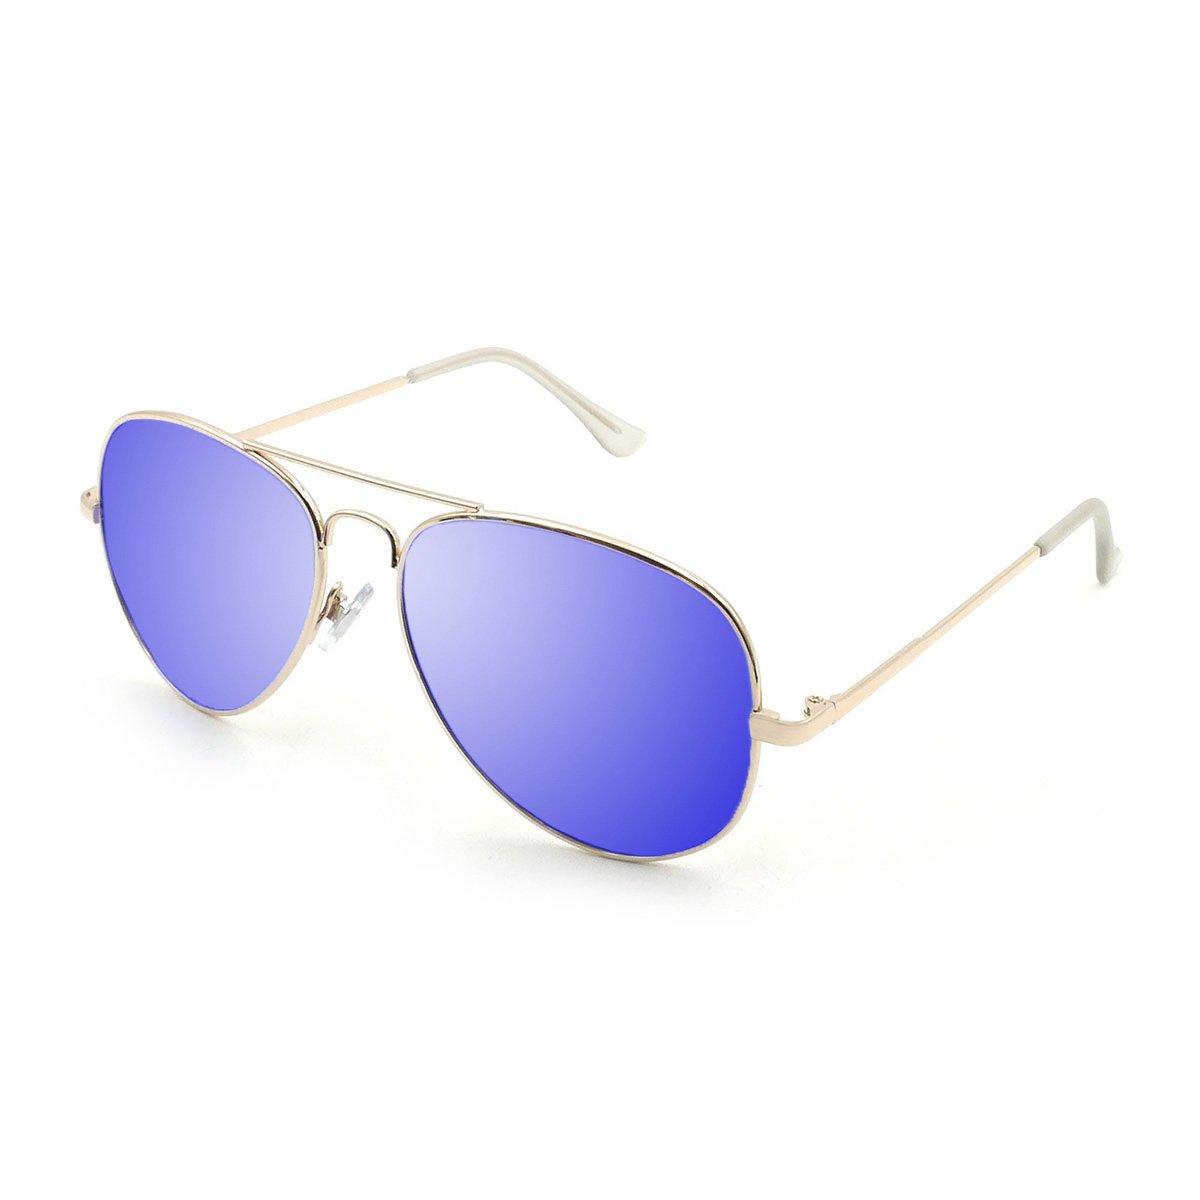 OCEAN SUNGLASSES Banila aviator - lunettes de soleil en MÃBlackrolltal - Monture : DorÃBlackroll - Verres : Revo Bleu (3701.2) Sss37K